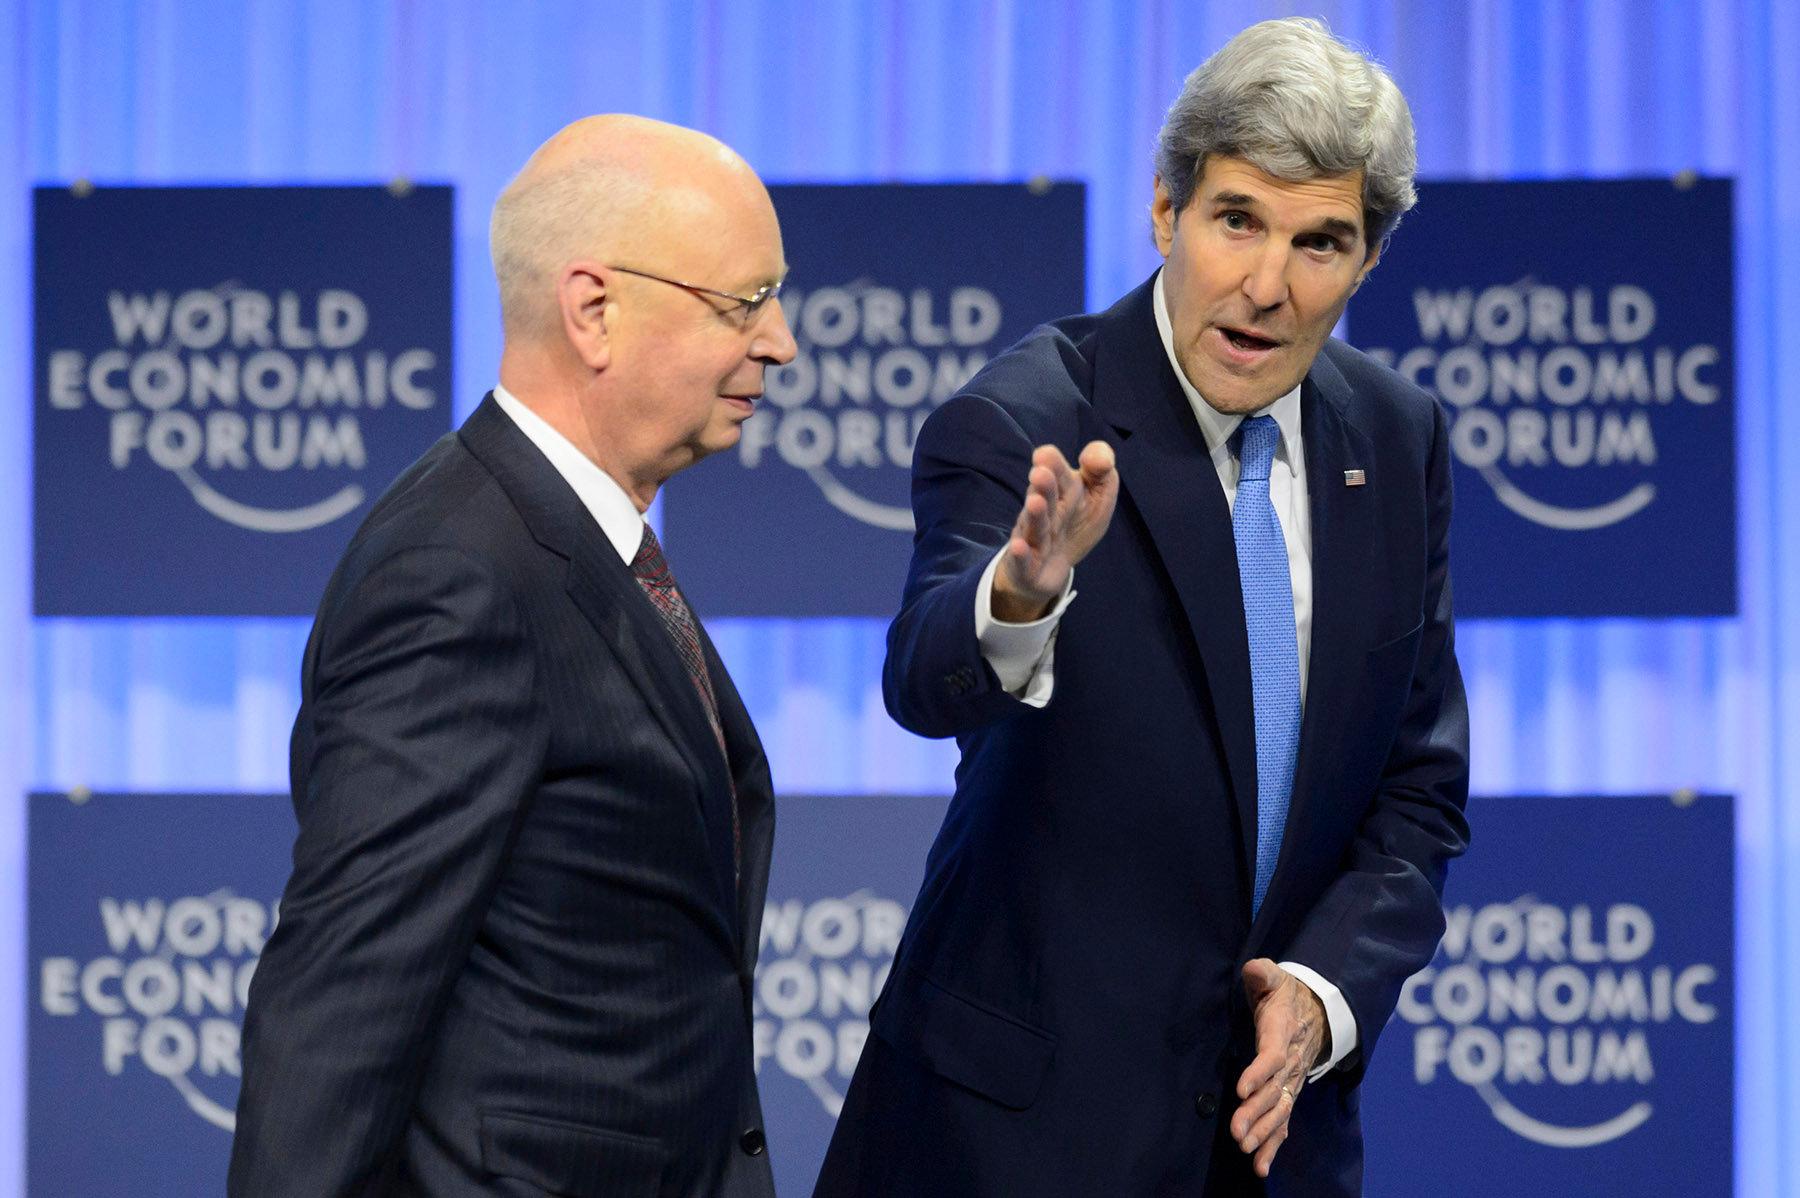 John Kerry - World Economic Forum - 2014